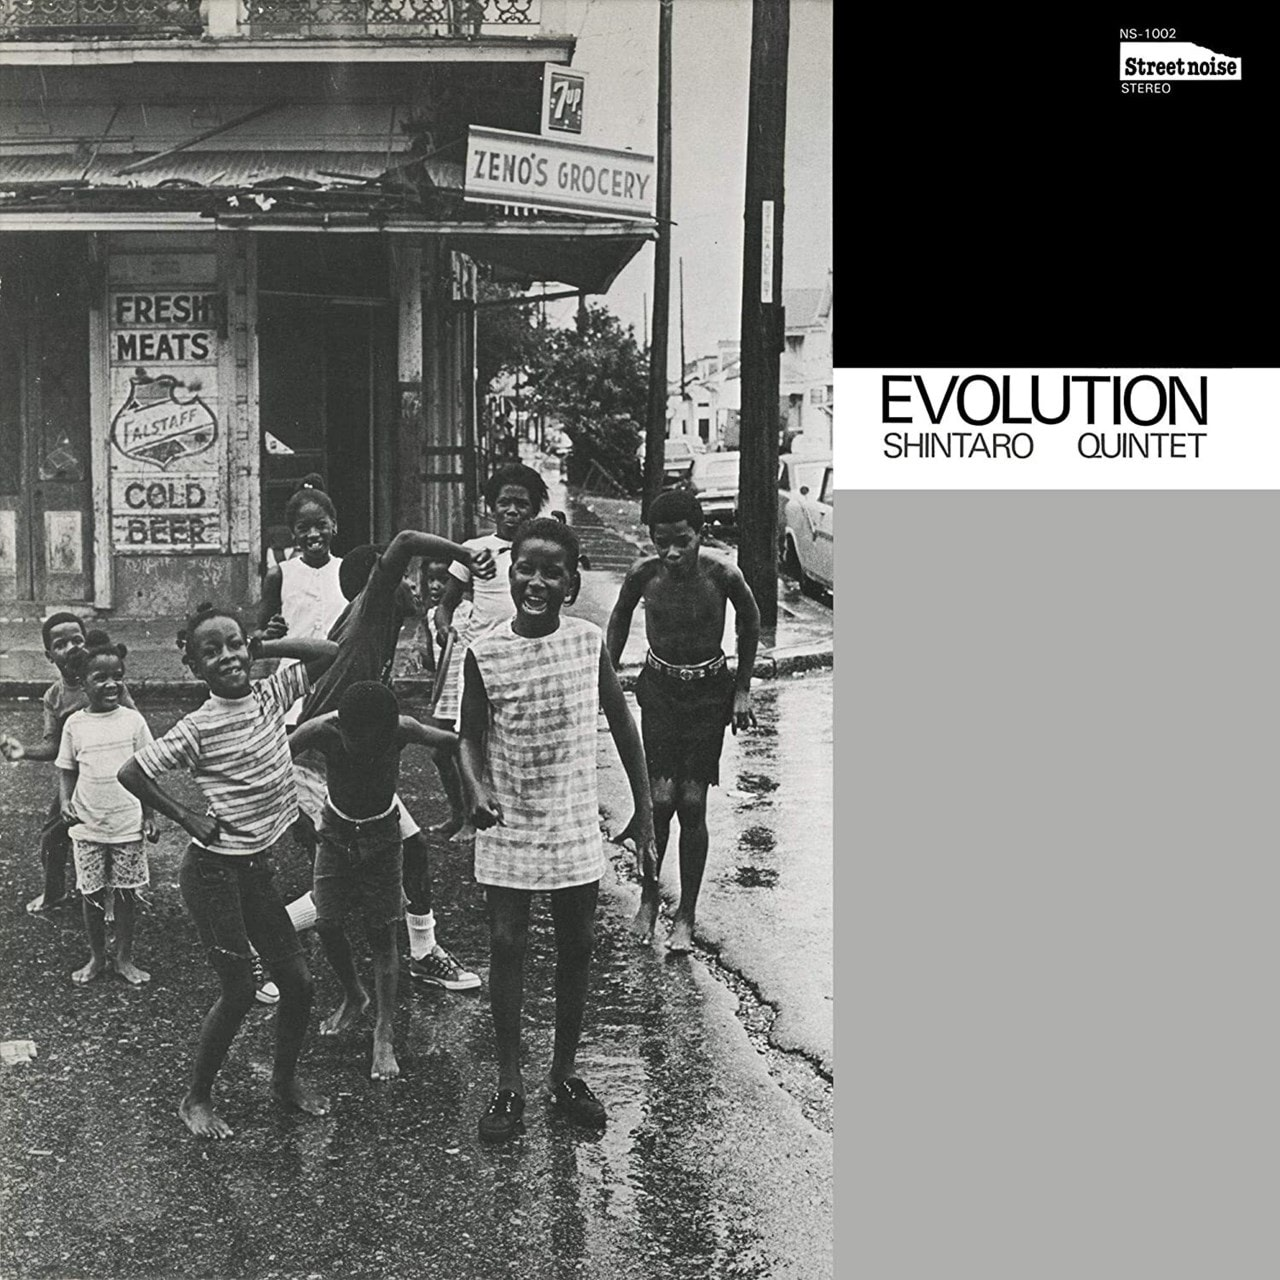 Evolution - 1